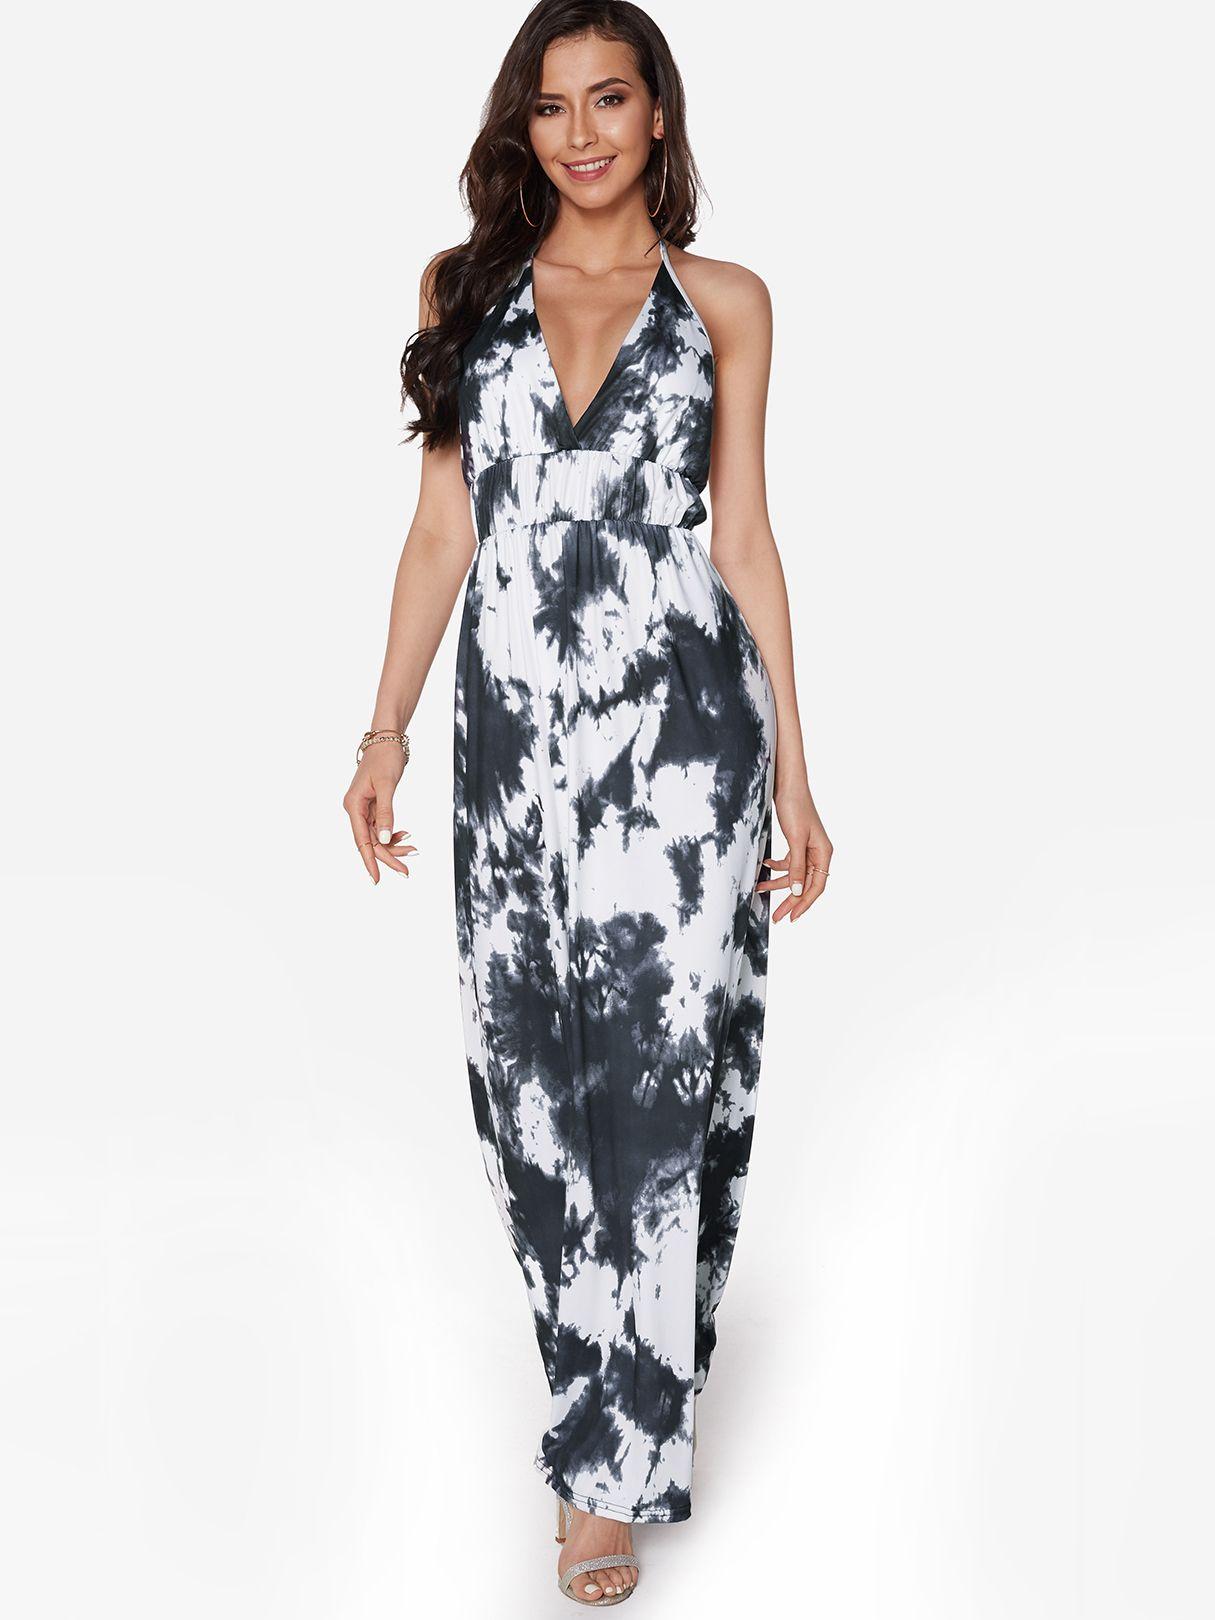 2659abc71638 Black Random Floral Print Backless Design Halter V-neck Sleeveless Maxi  Dress